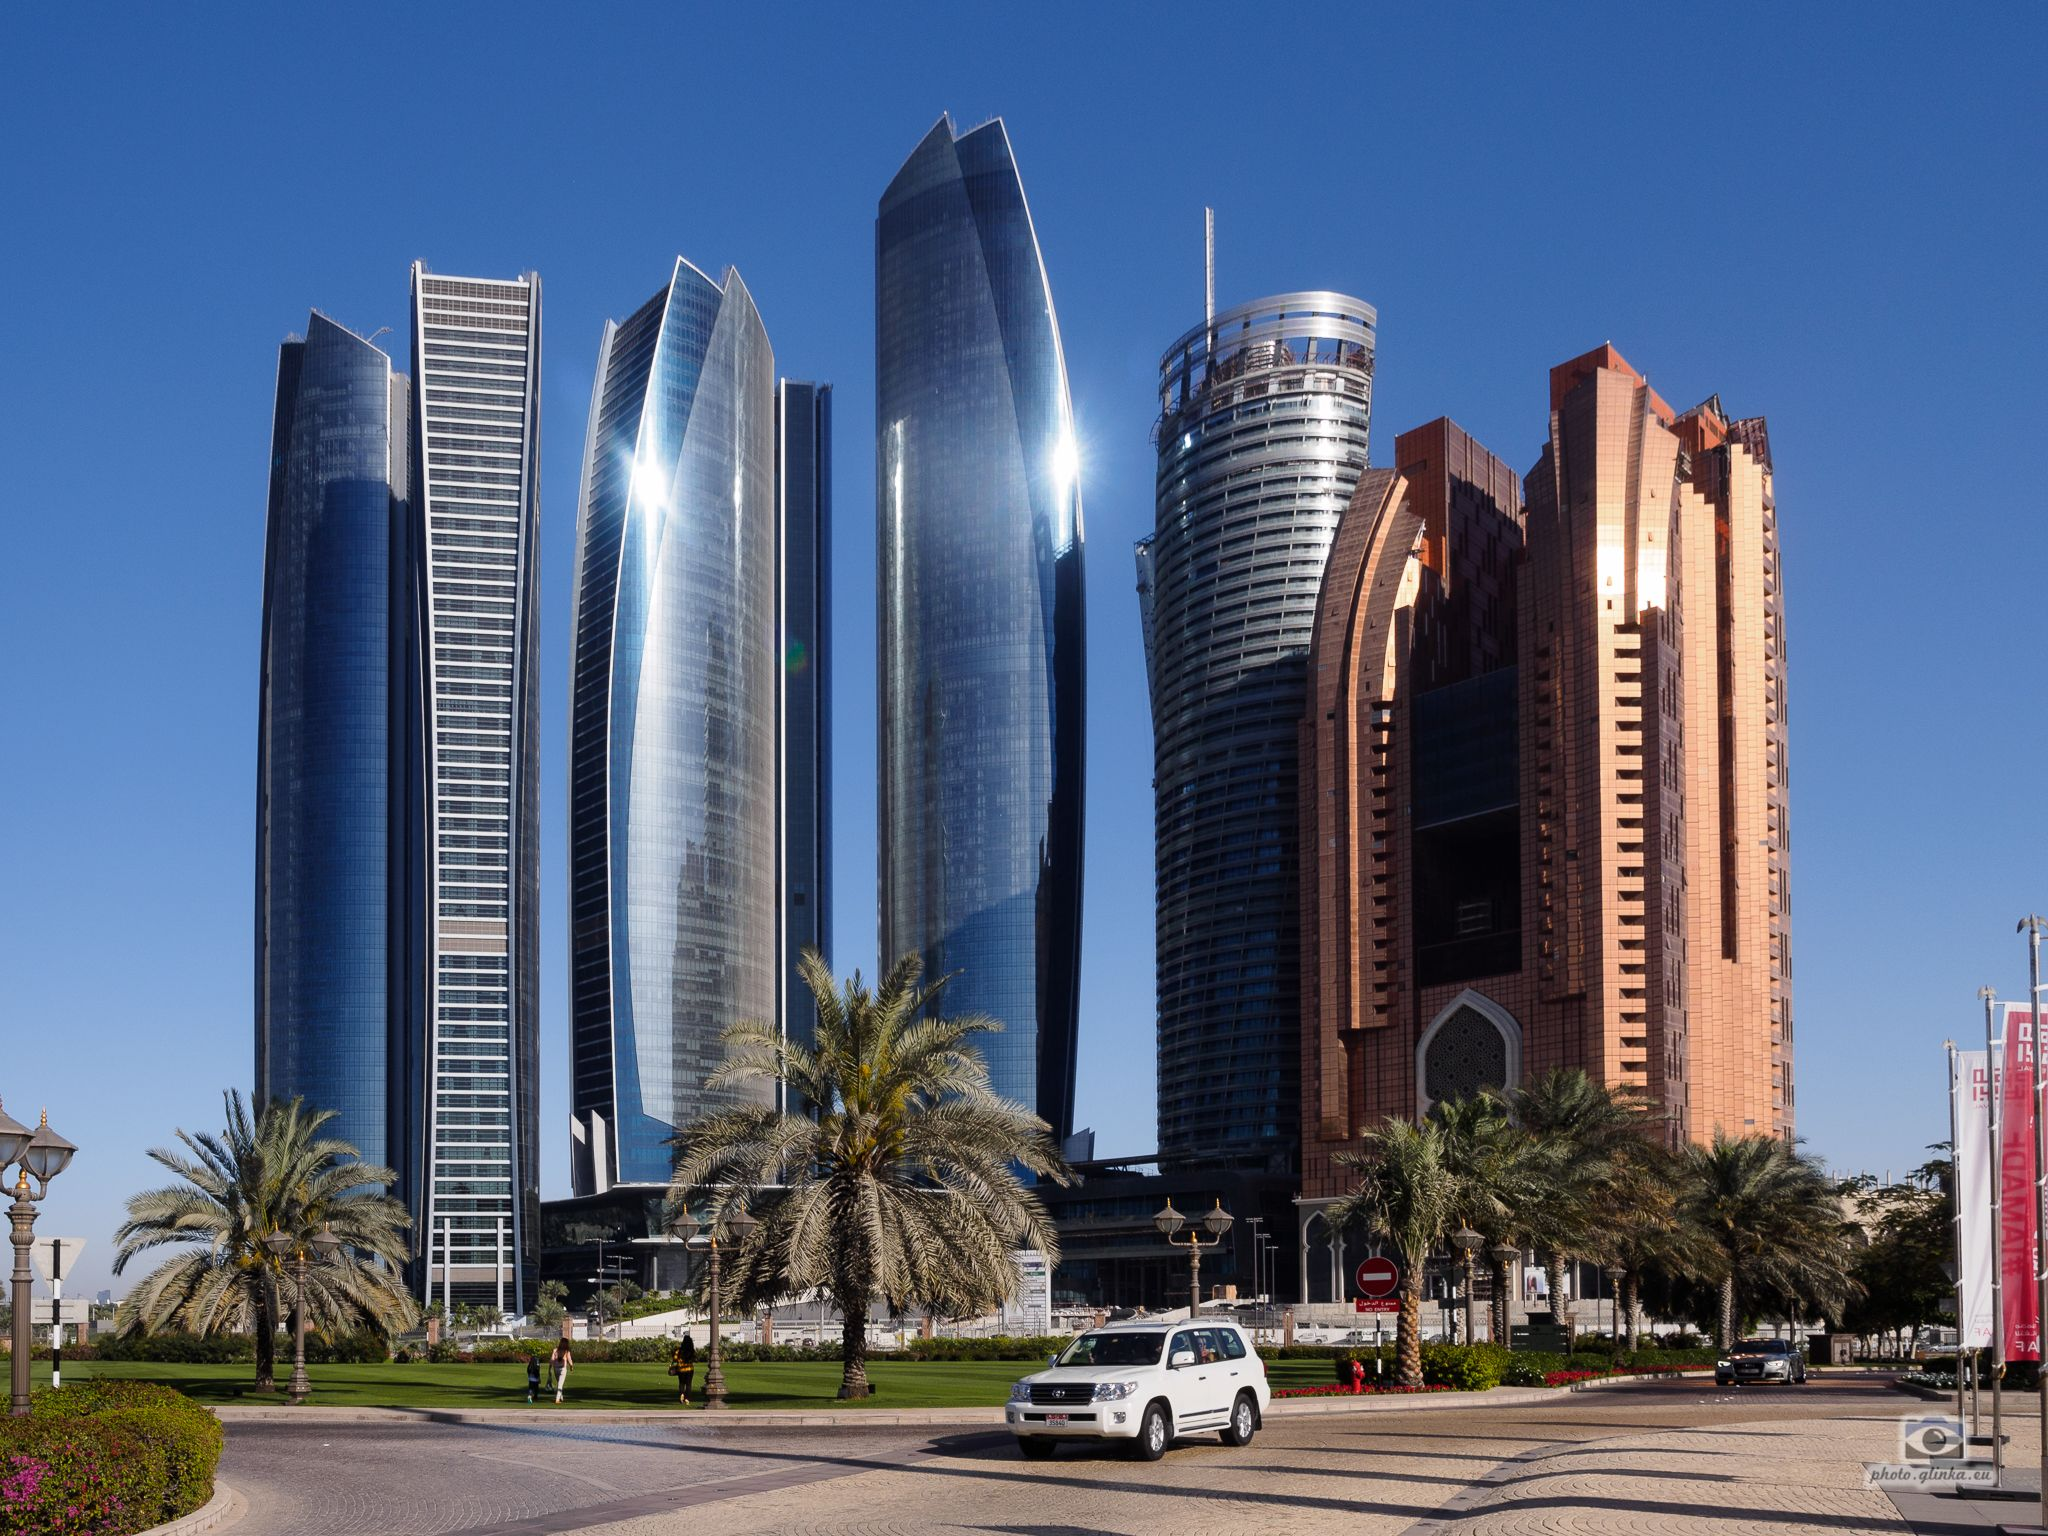 Dark_angel10 - Abu Dhabi, Abu Dhabi, United Arab Emirates